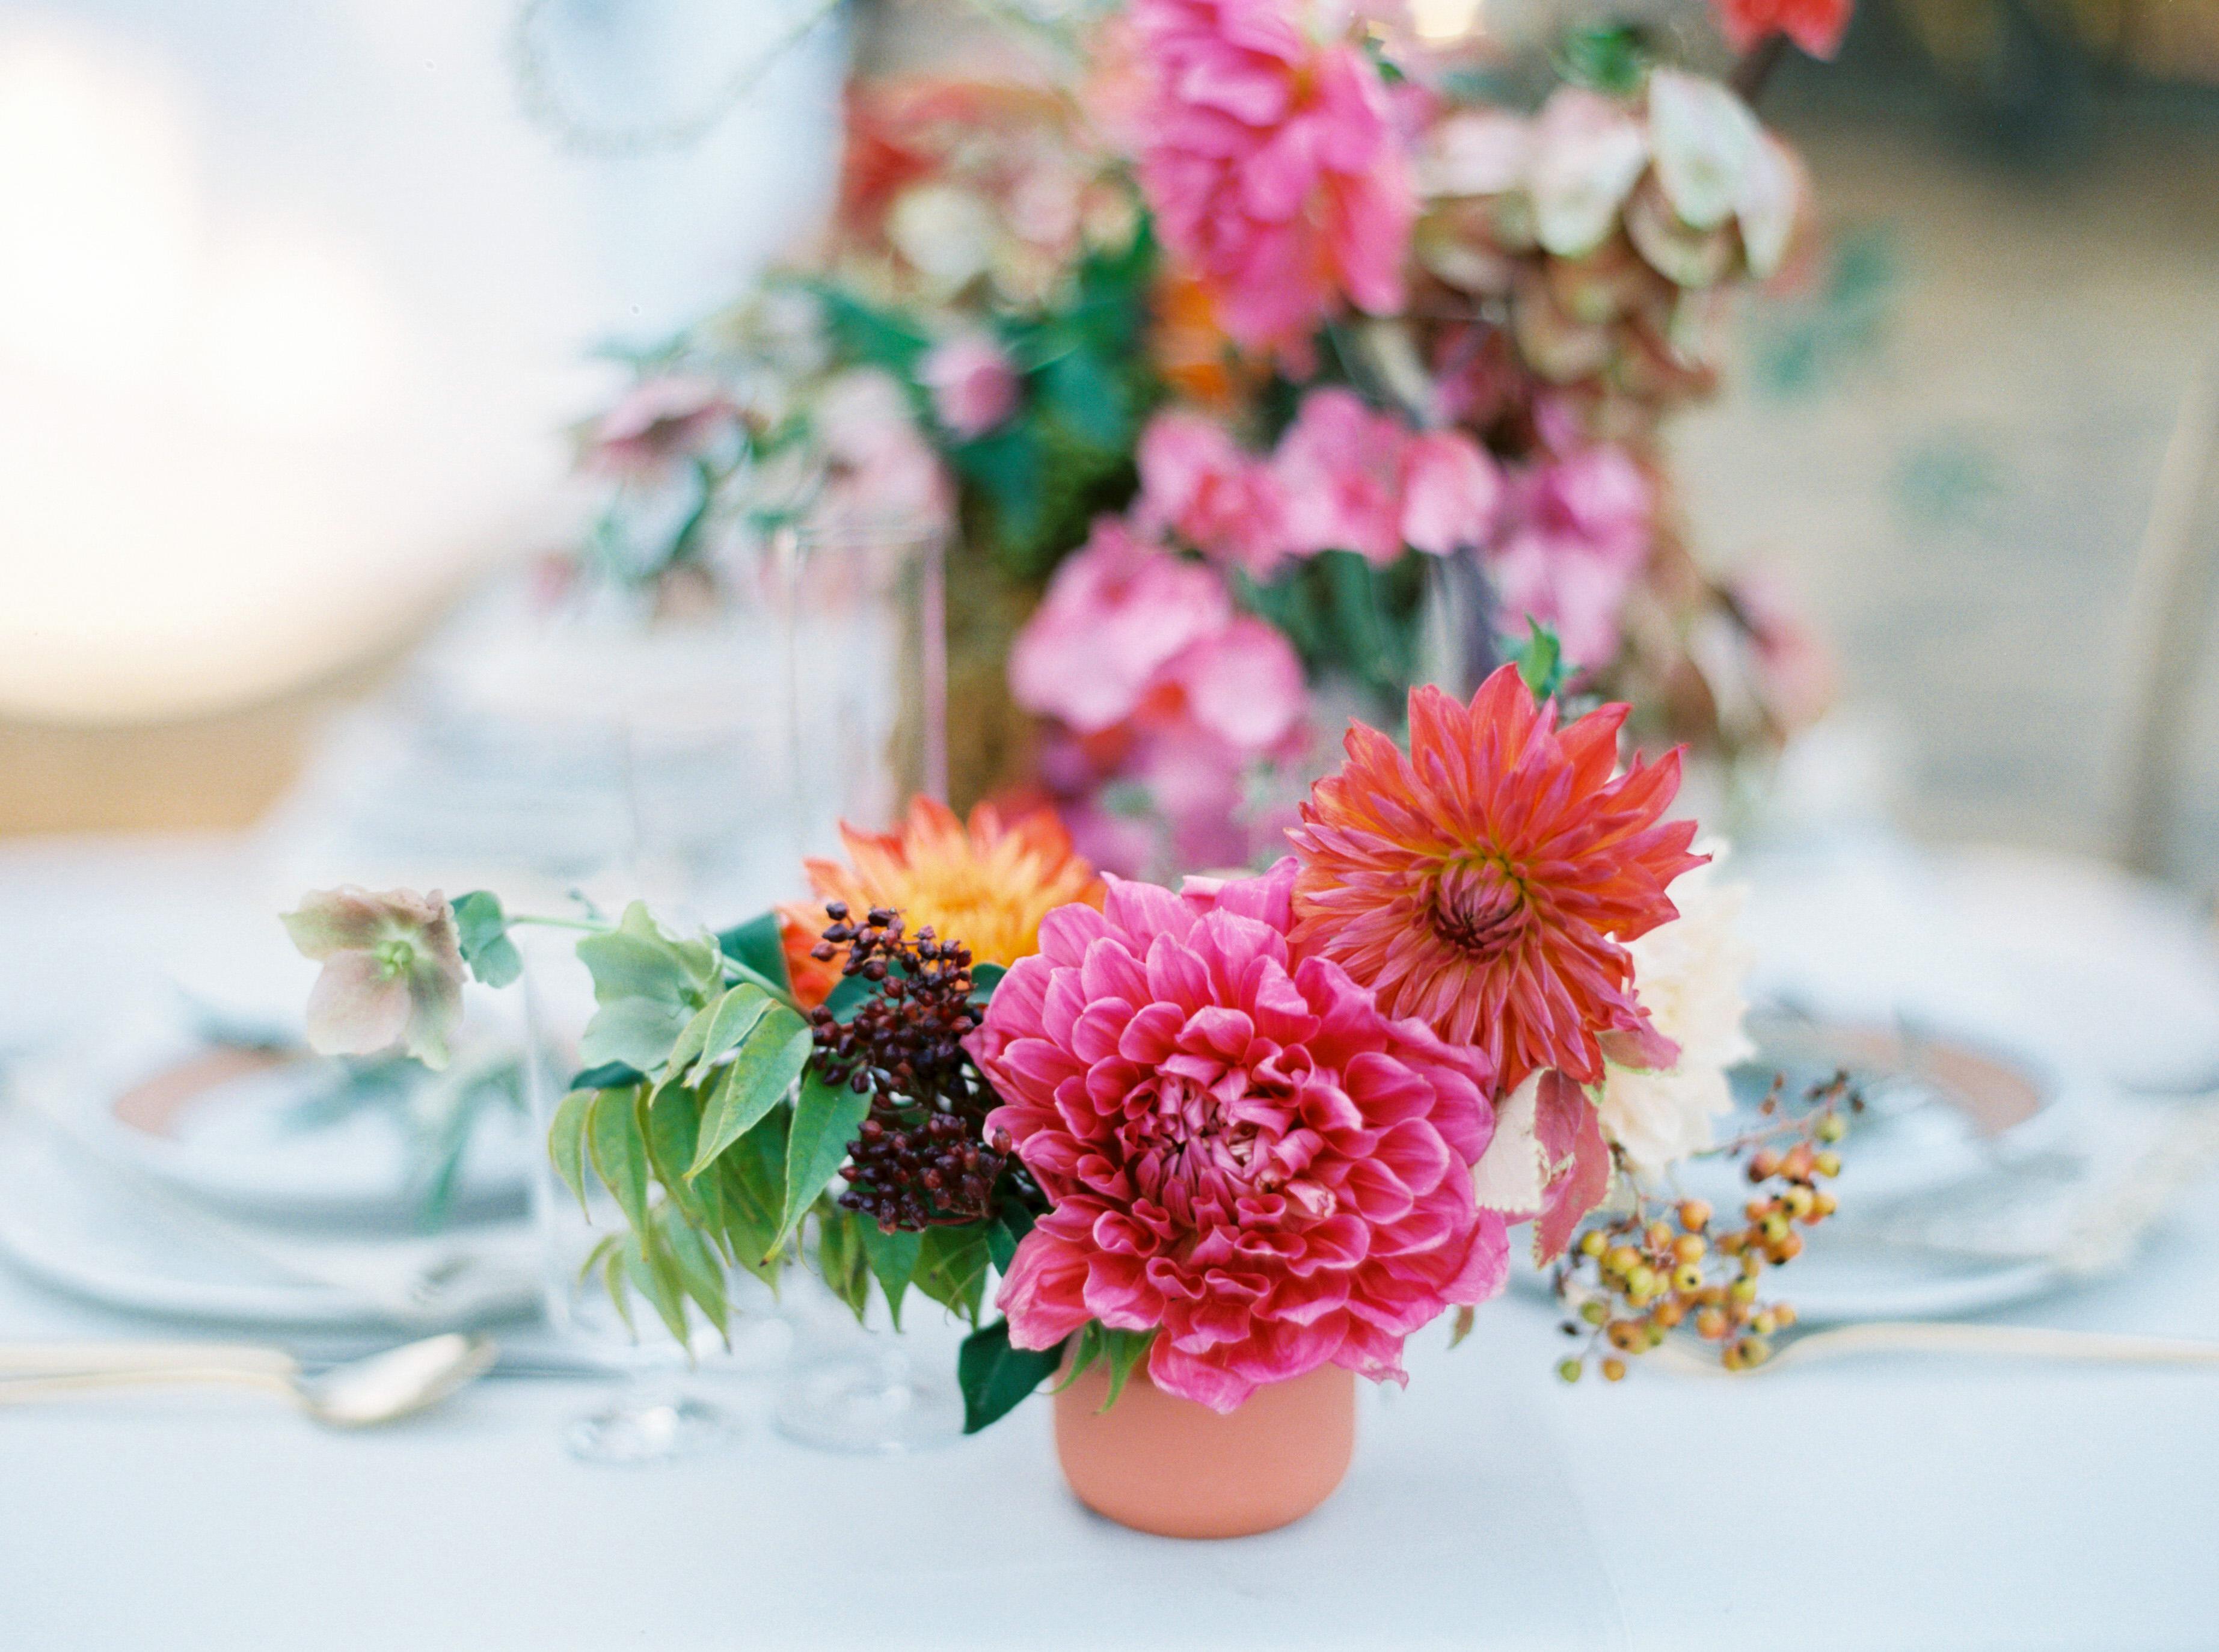 dahlia wedding centerpieces small pink arrangement